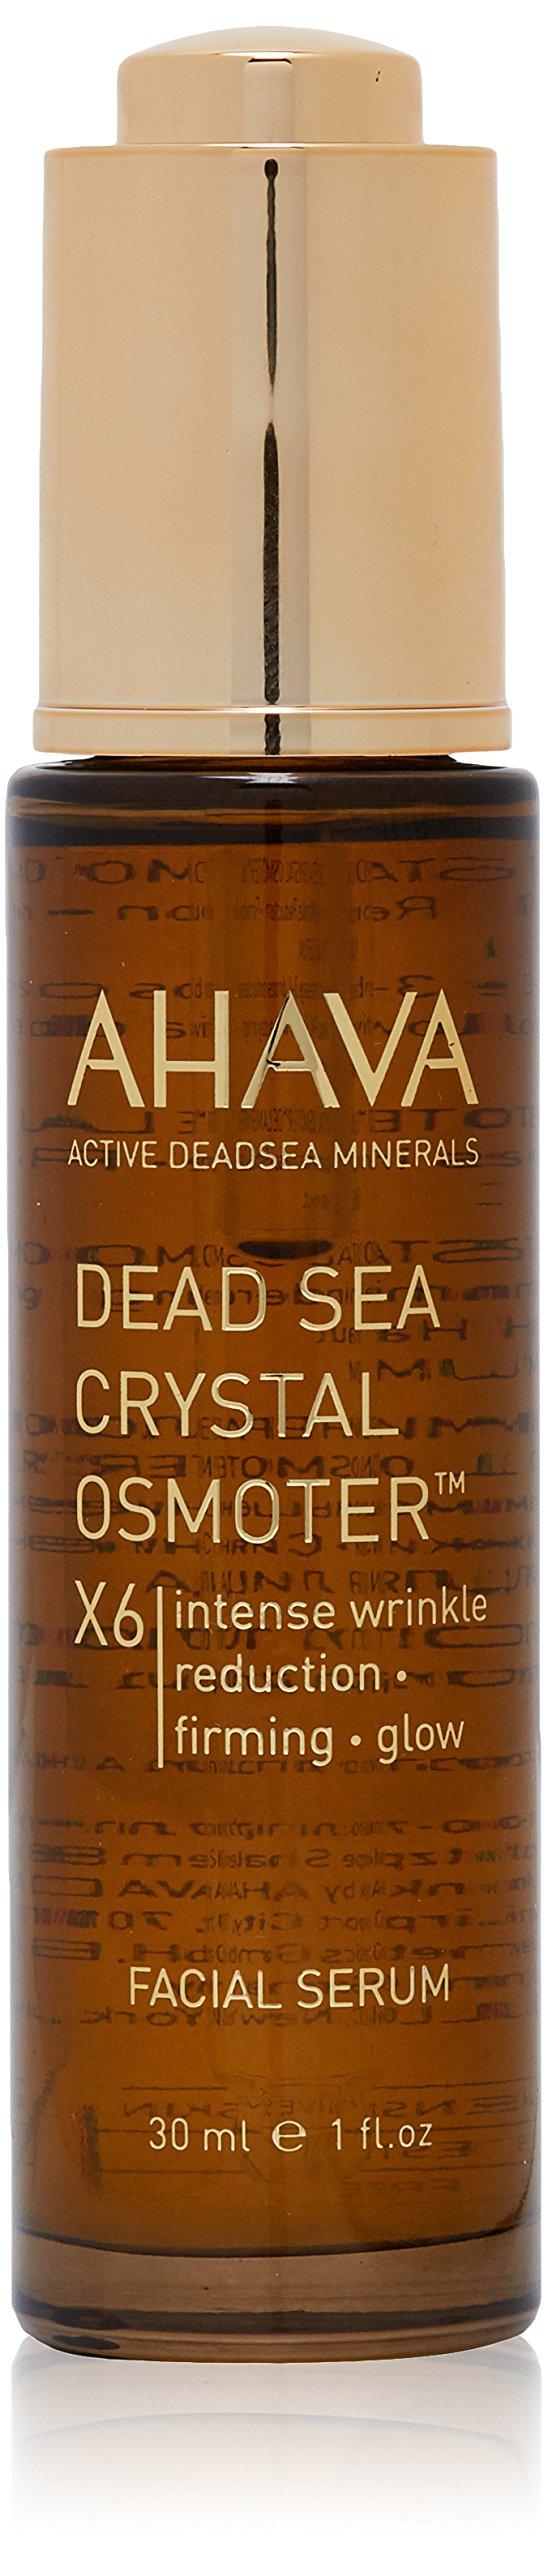 AHAVA Dead Sea Crystal Osmoter X6 Facial Serum, 1 fl.oz.